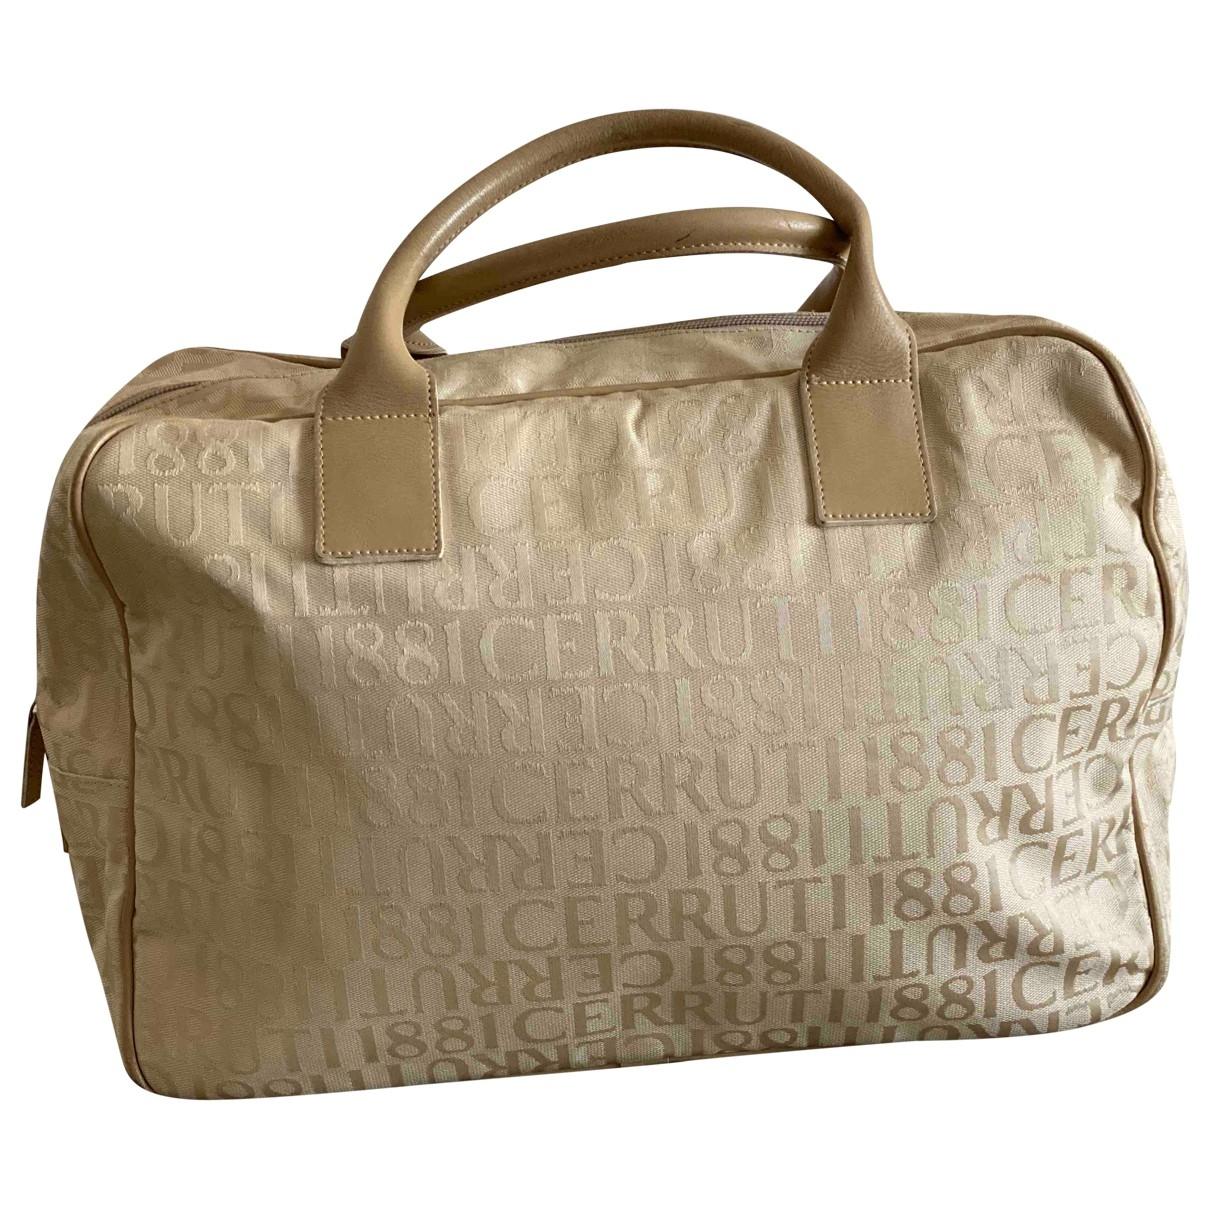 Cerruti \N Ecru Cloth handbag for Women \N